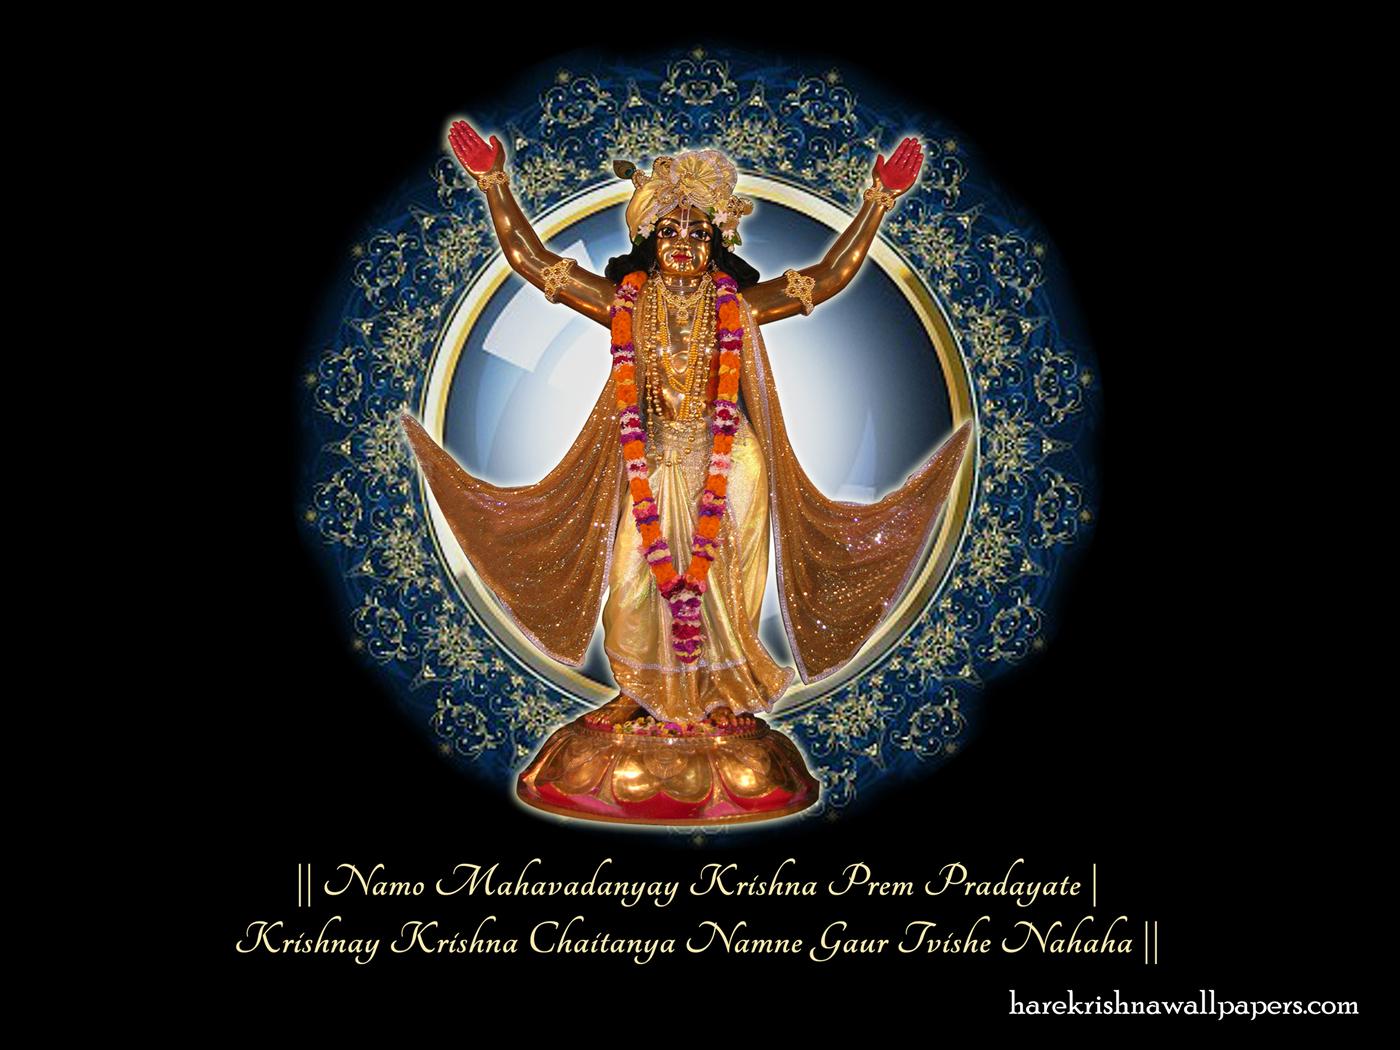 Chaitanya Mahaprabhu Wallpaper (001) Size 1400x1050 Download